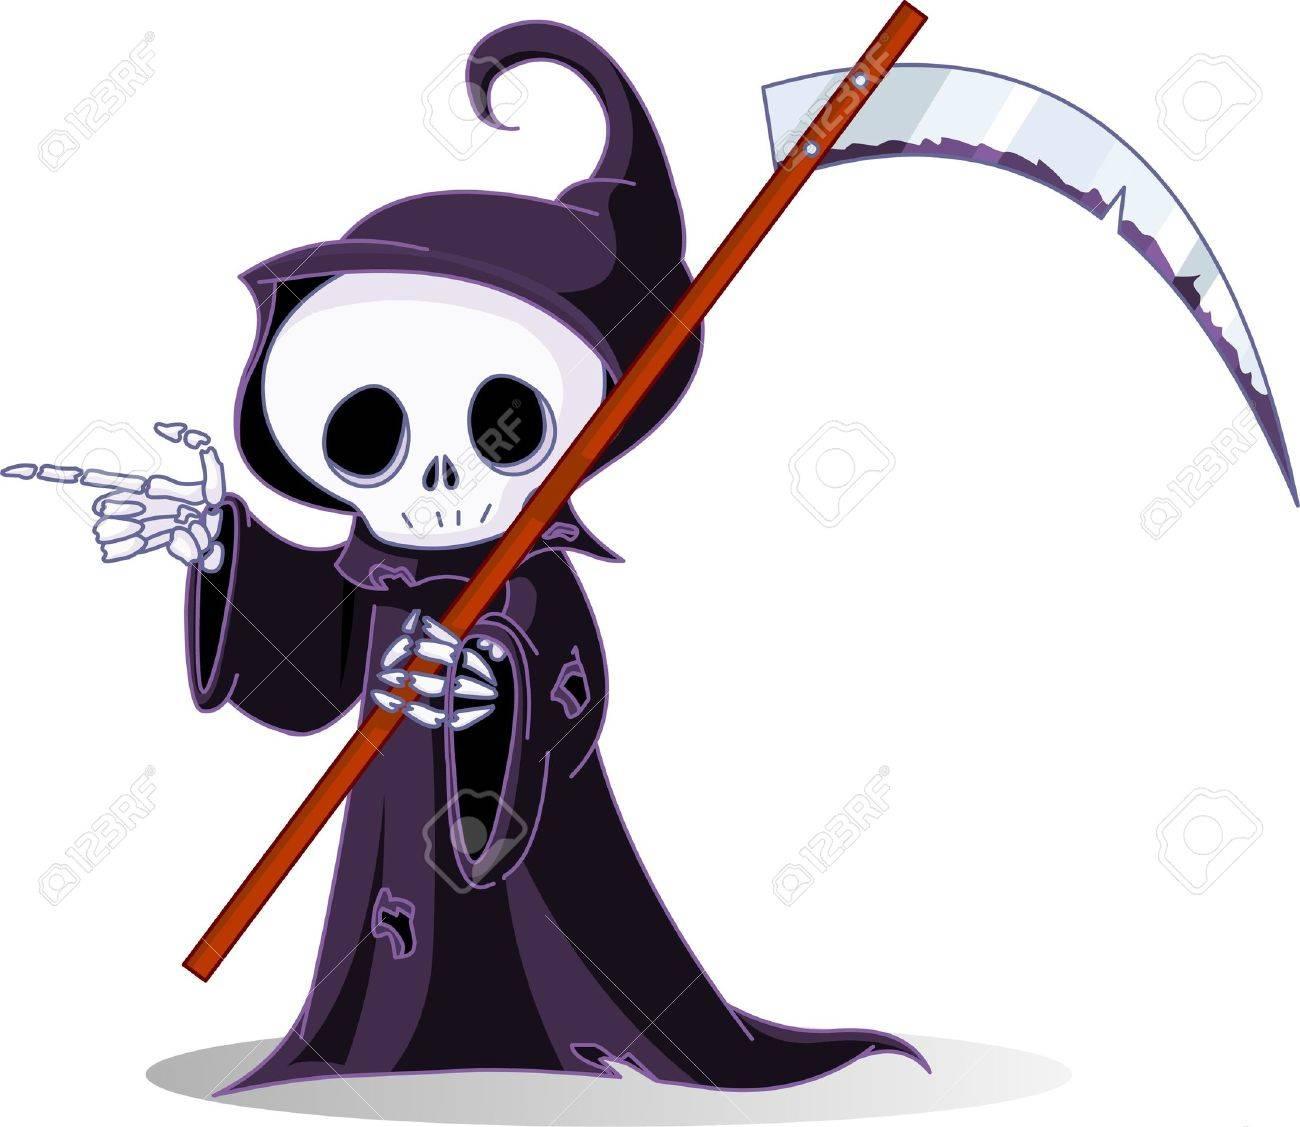 3 672 grim reaper stock illustrations cliparts and royalty free rh 123rf com grim reaper clipart black and white grim reaper clip art free